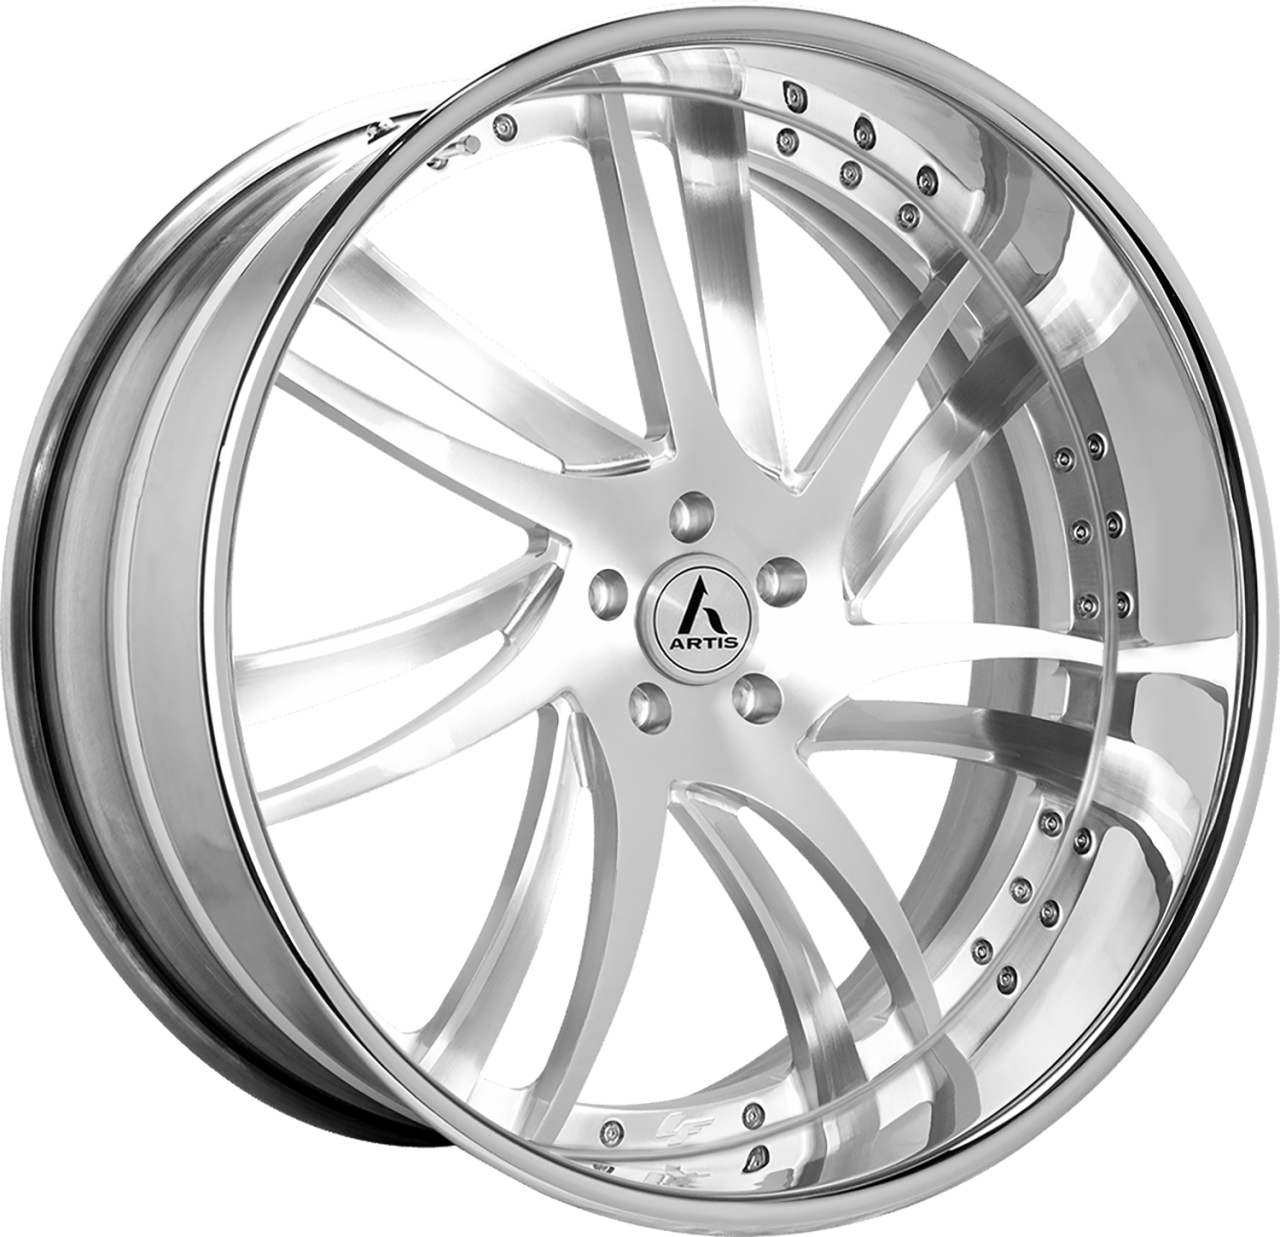 Artis Forged Profile-M wheel with Brushed finish